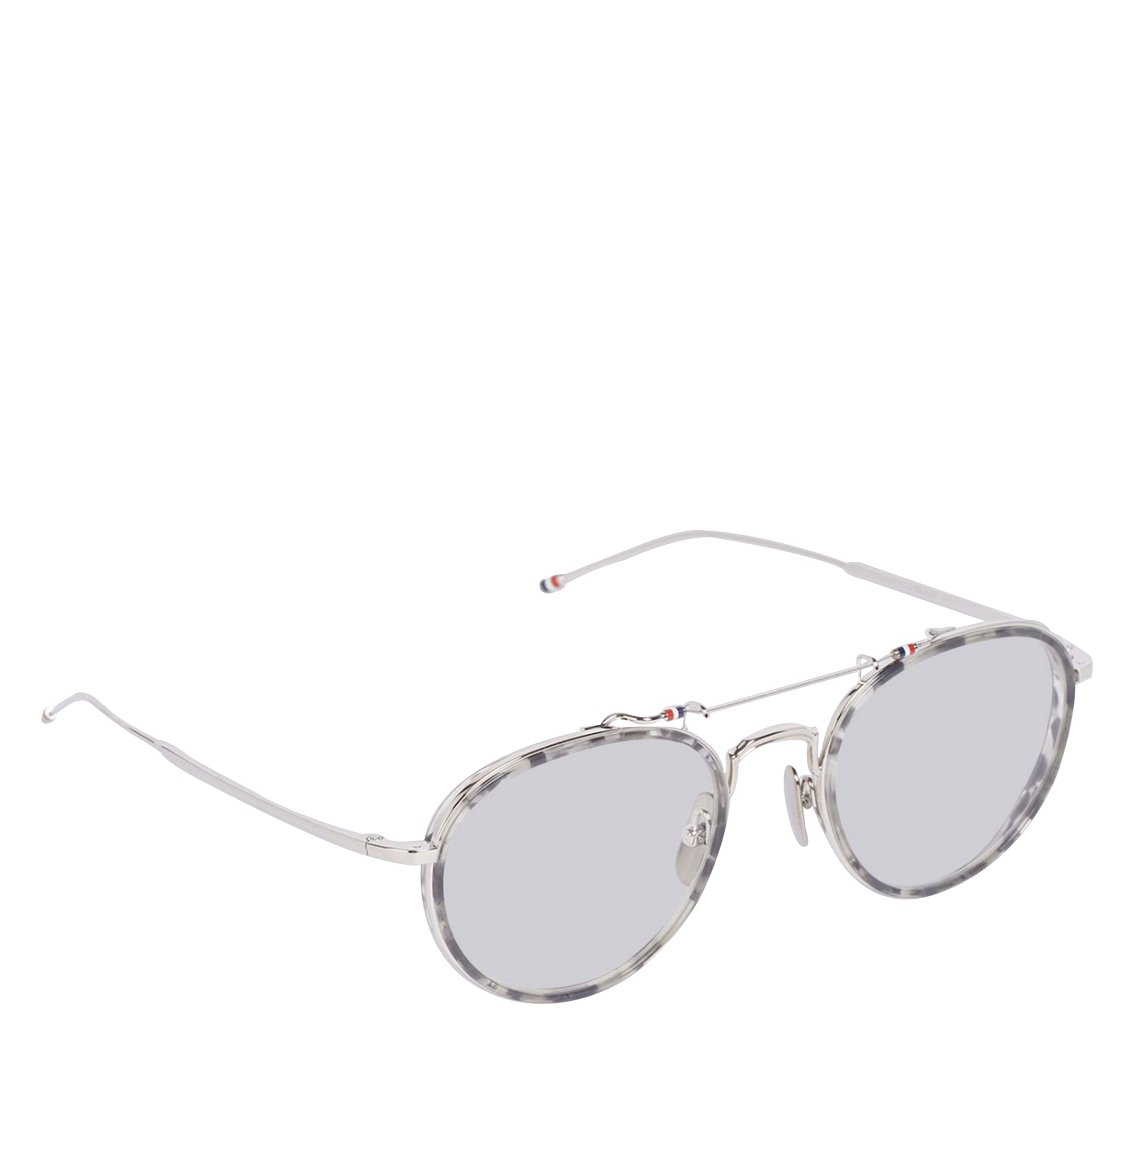 Thom Browne 53 Grey Tortoiseshell Oval Sunglasses Γυαλιά Ηλίου